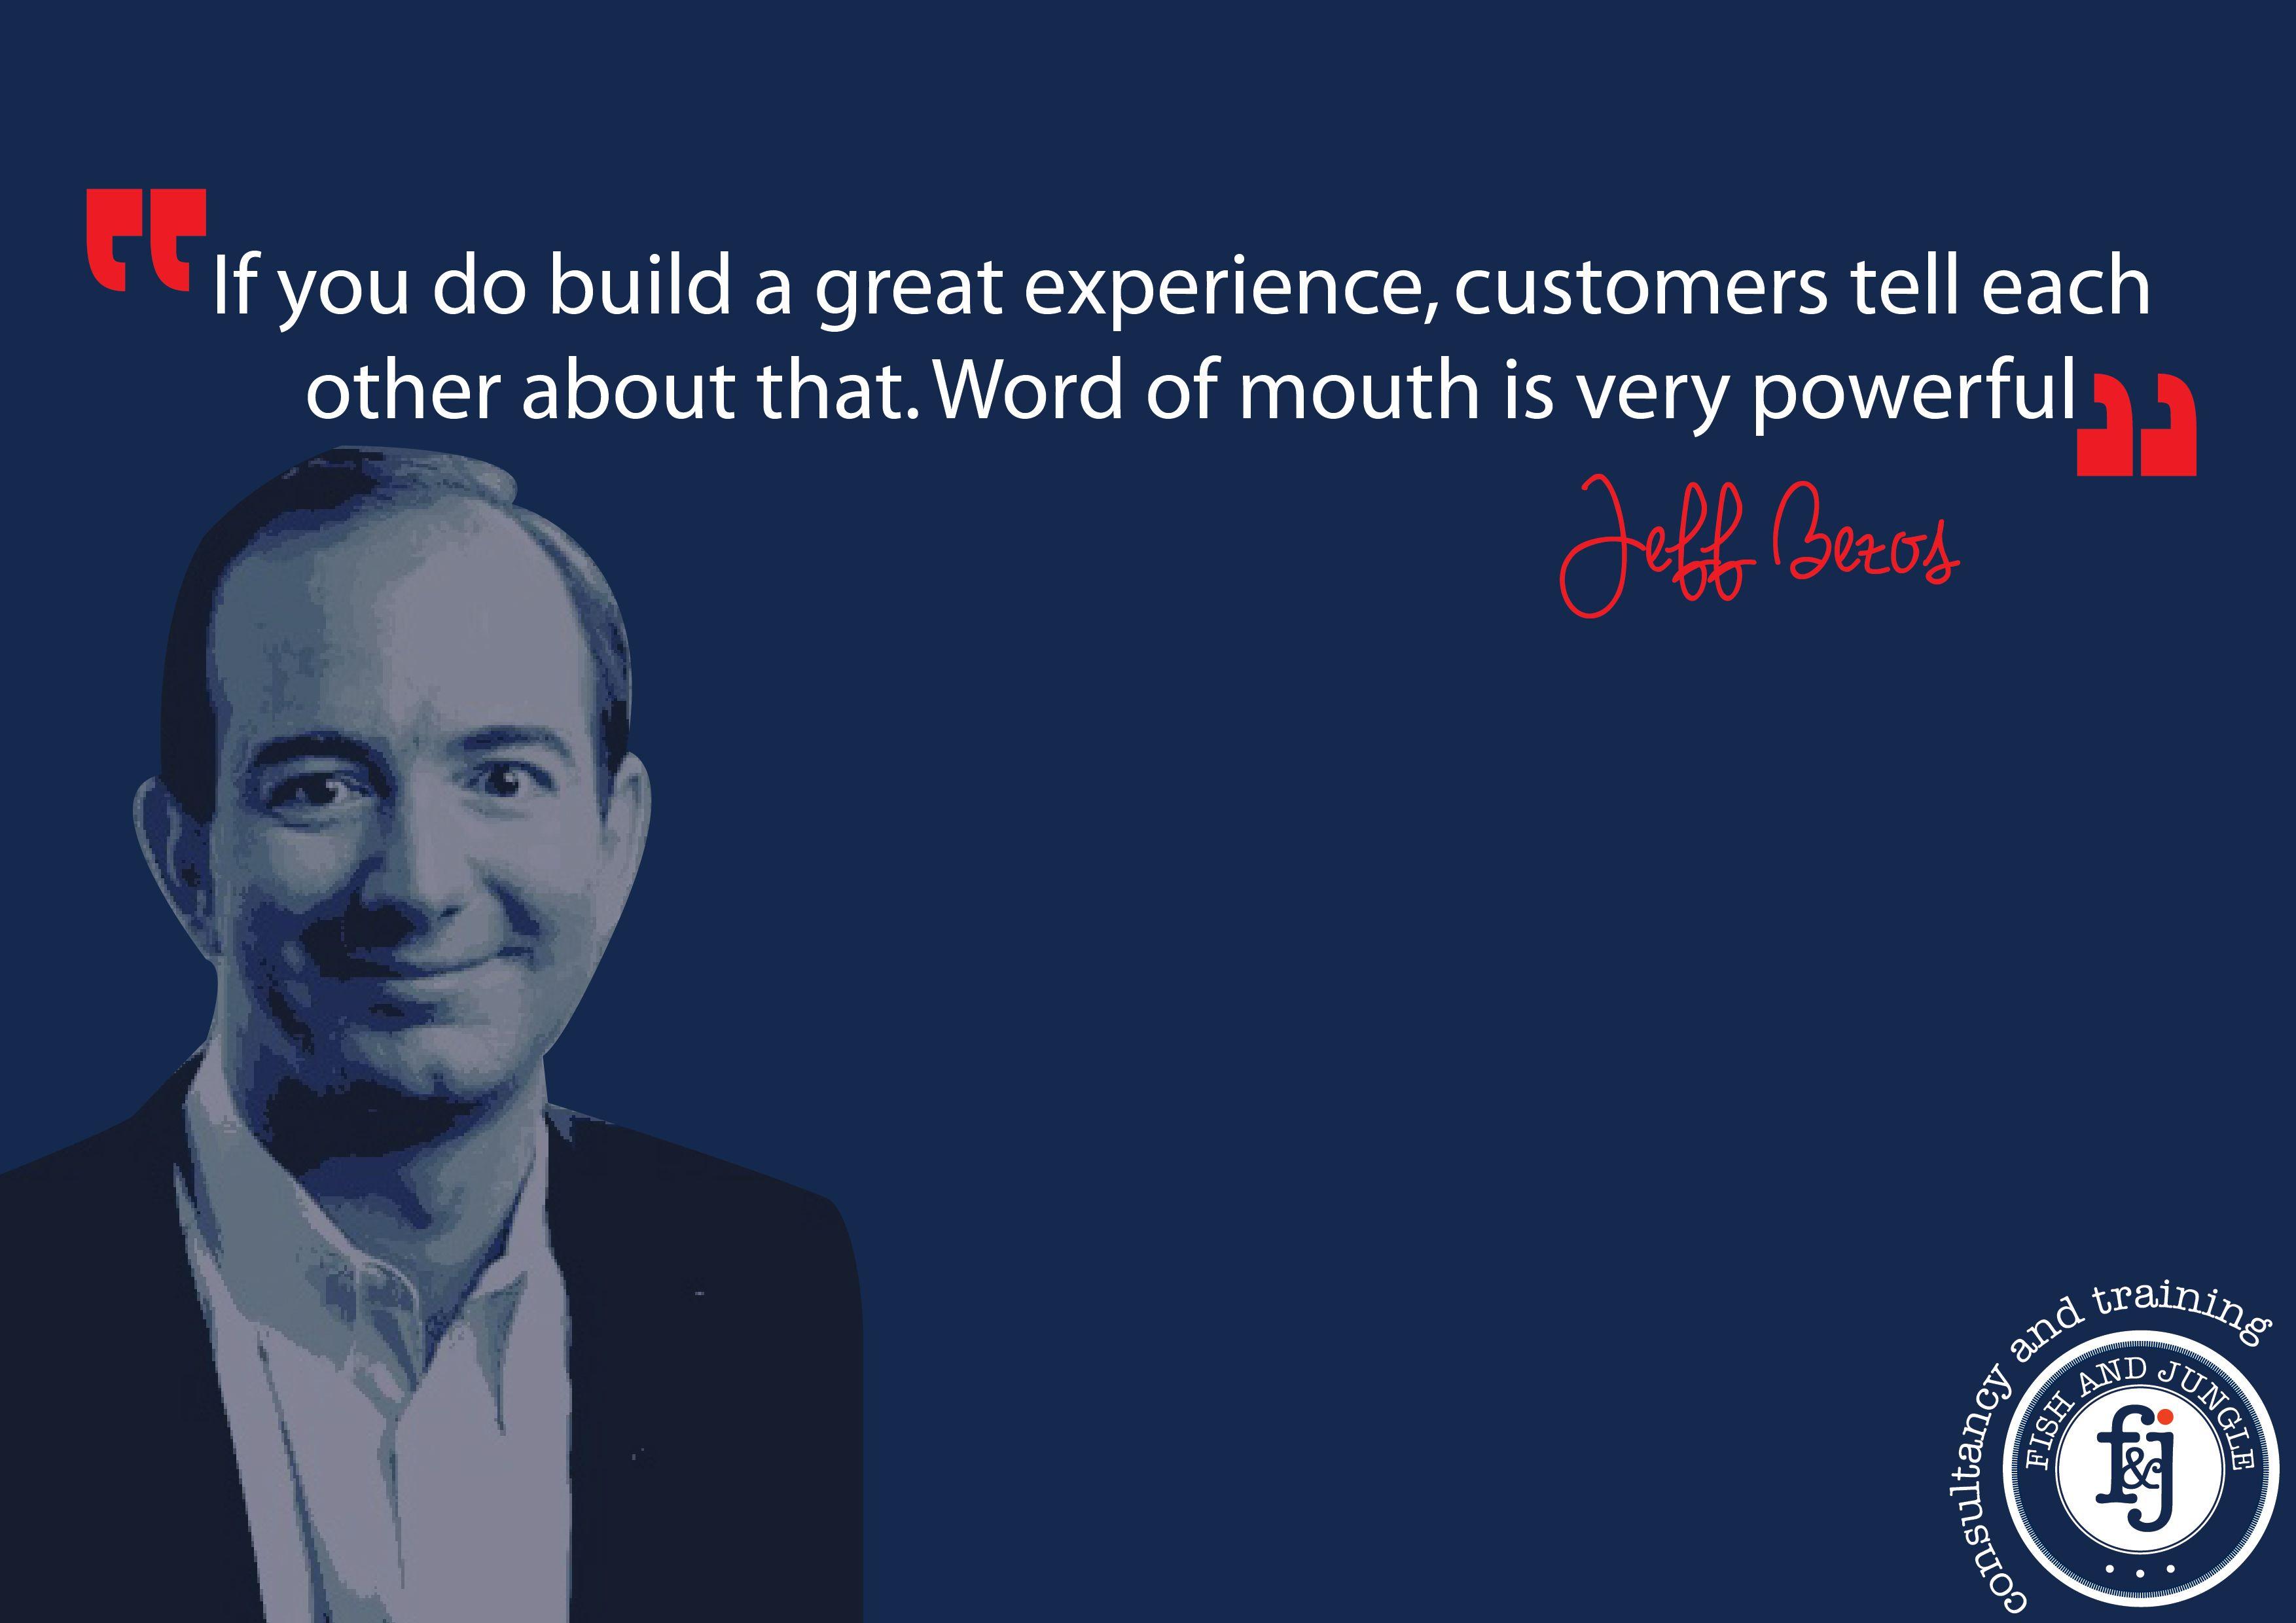 customer experience quotes jeff bezos